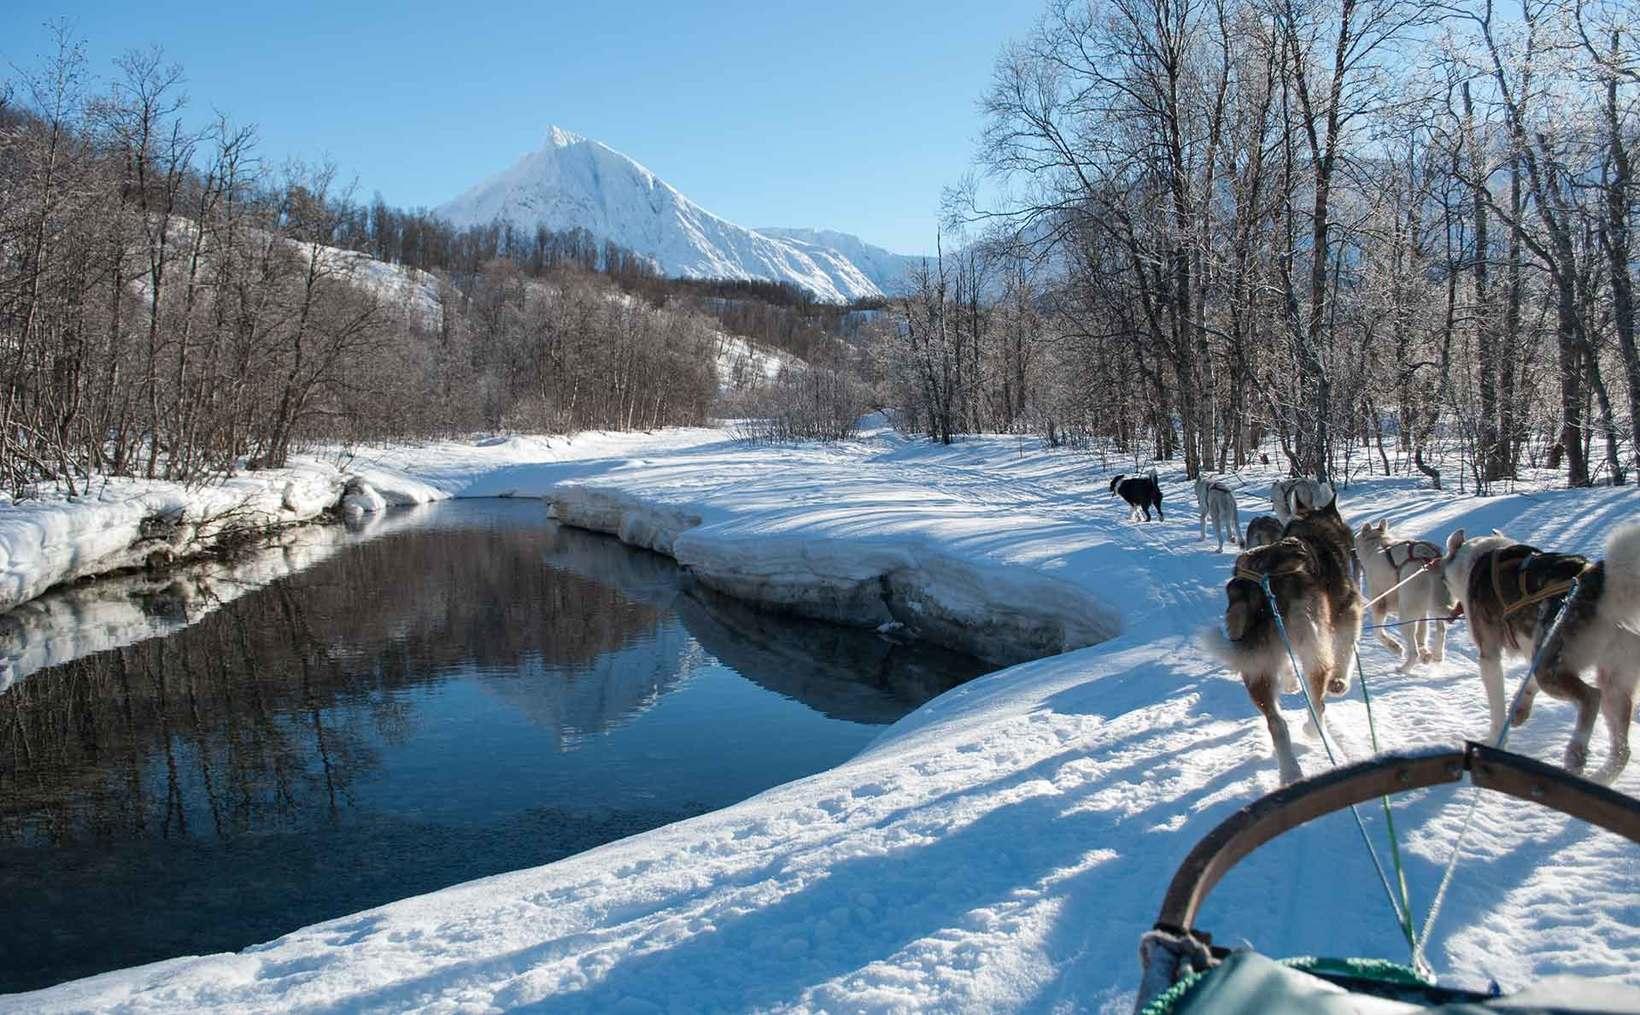 Dog sledding Arctic Cruie In Norway 9.jpg